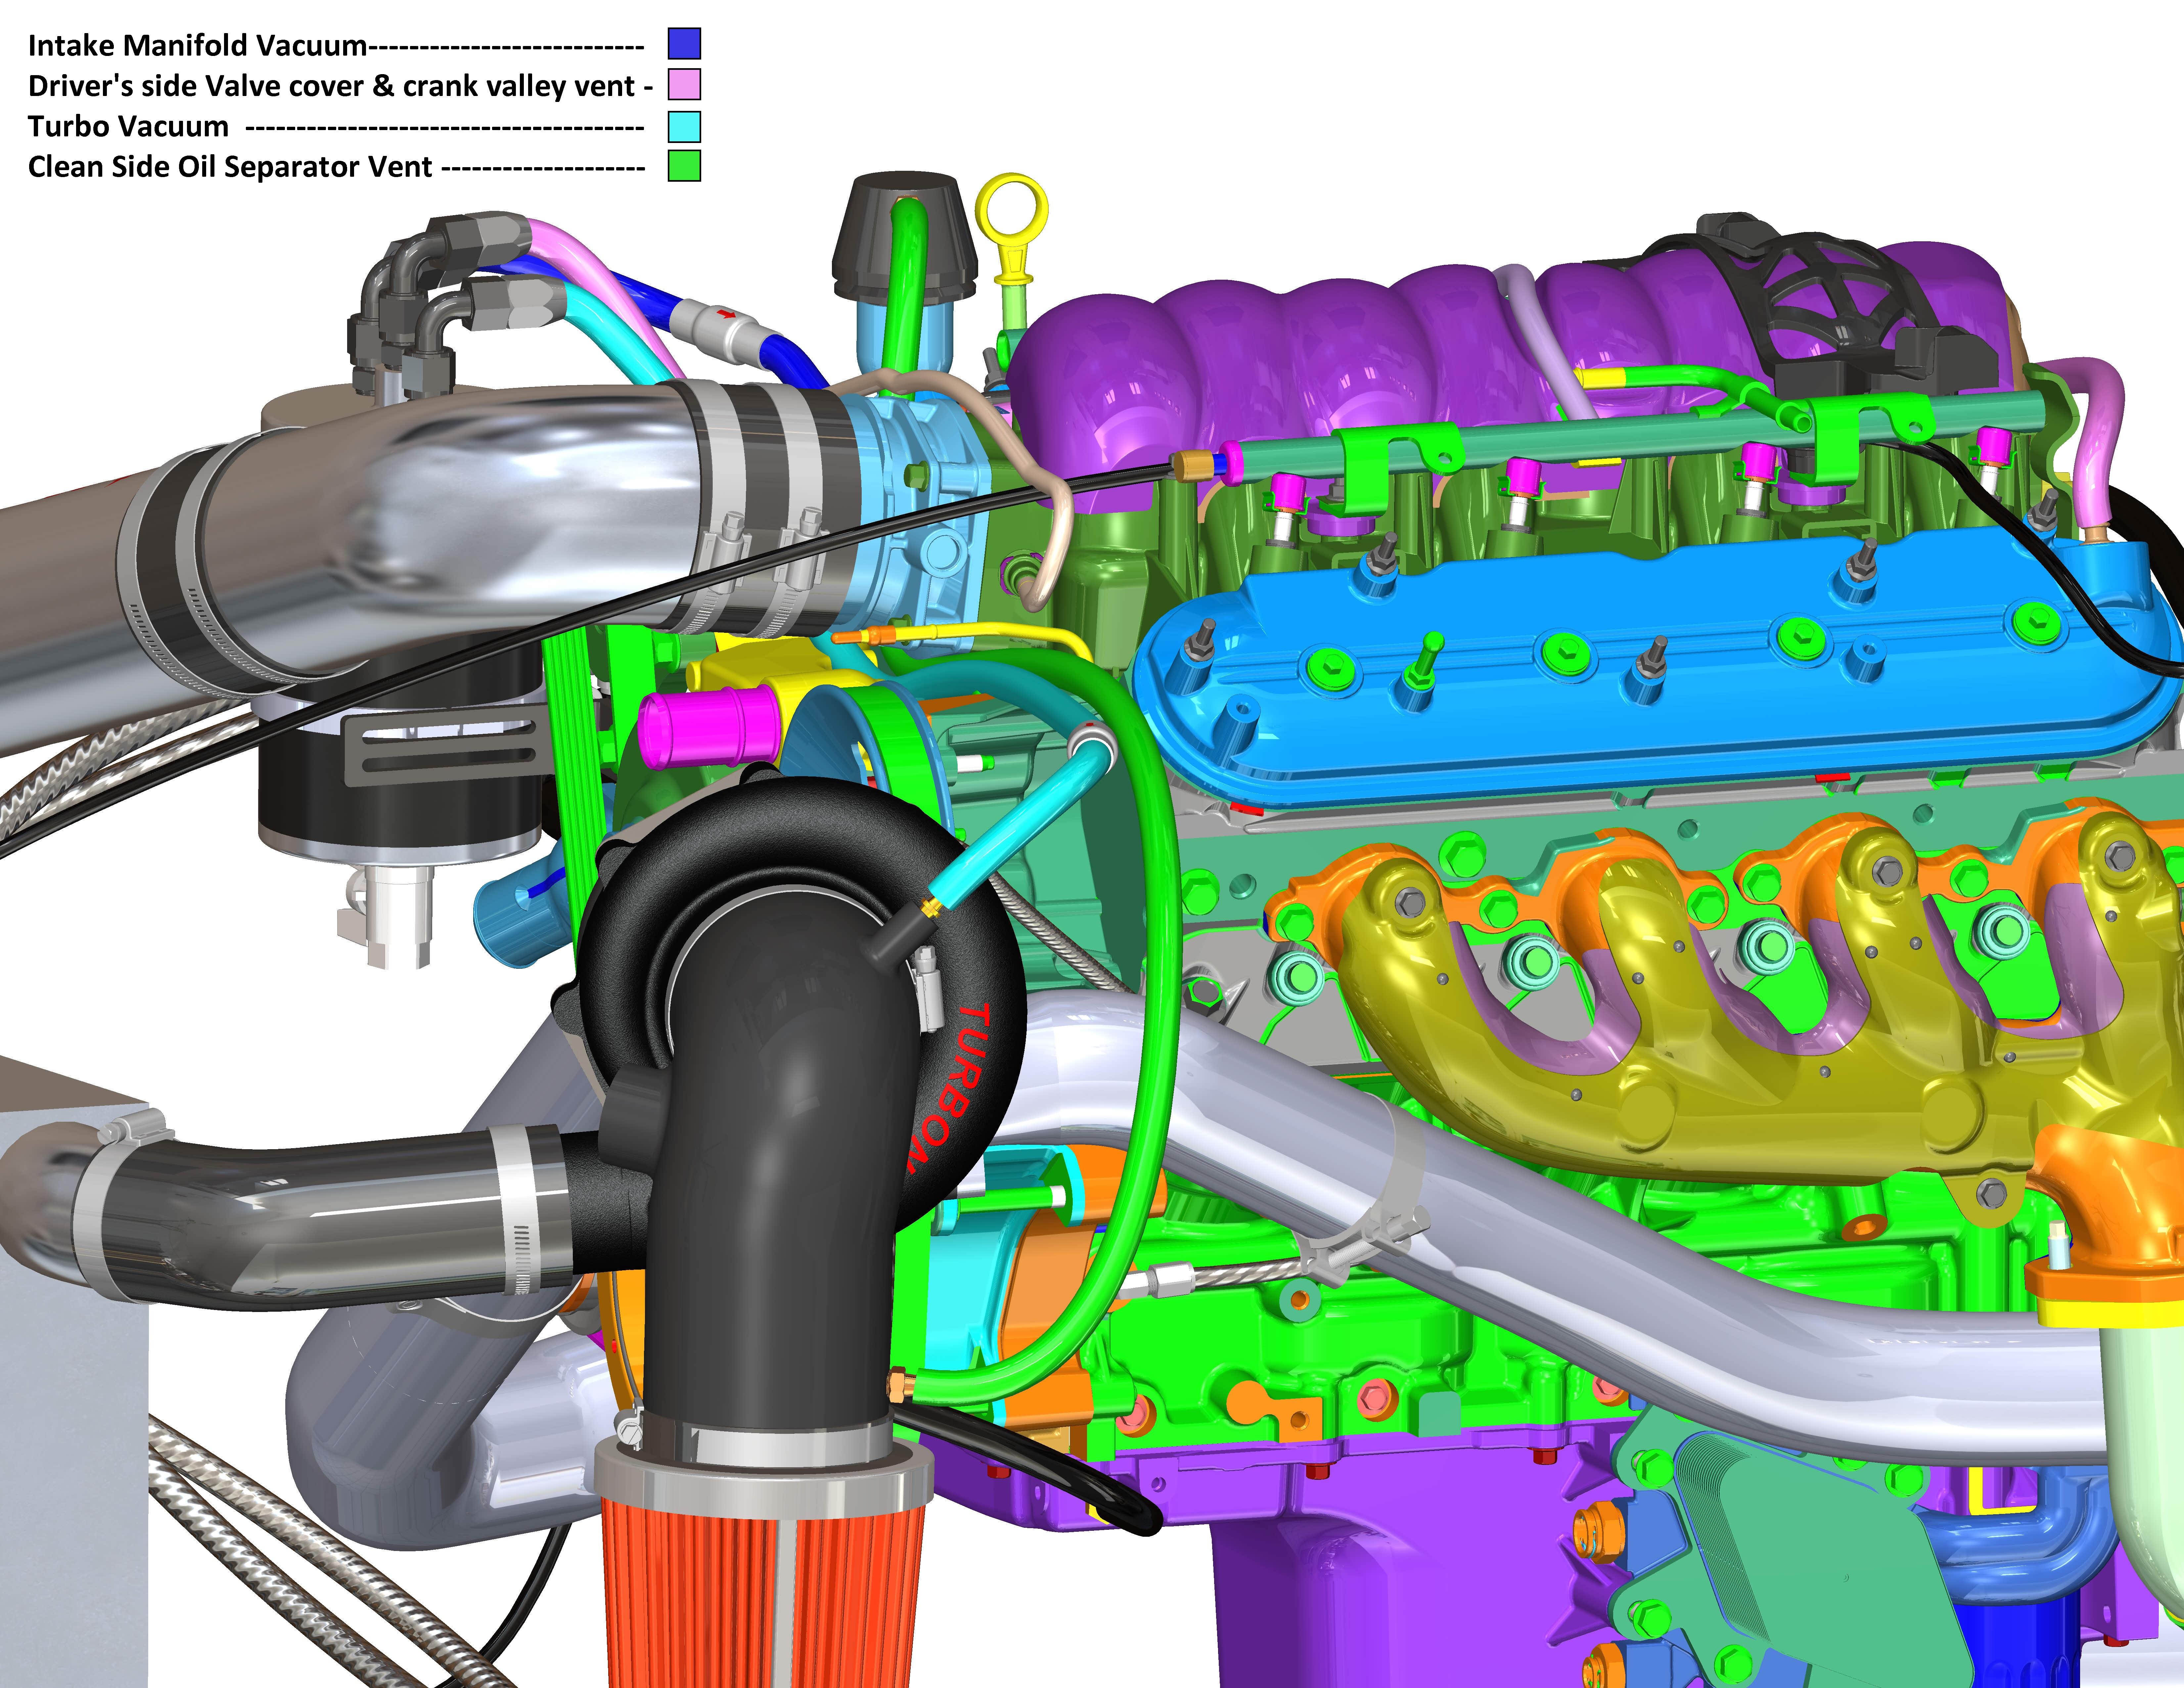 camaro-turbo-catch-can-install-diagram-3.jpg